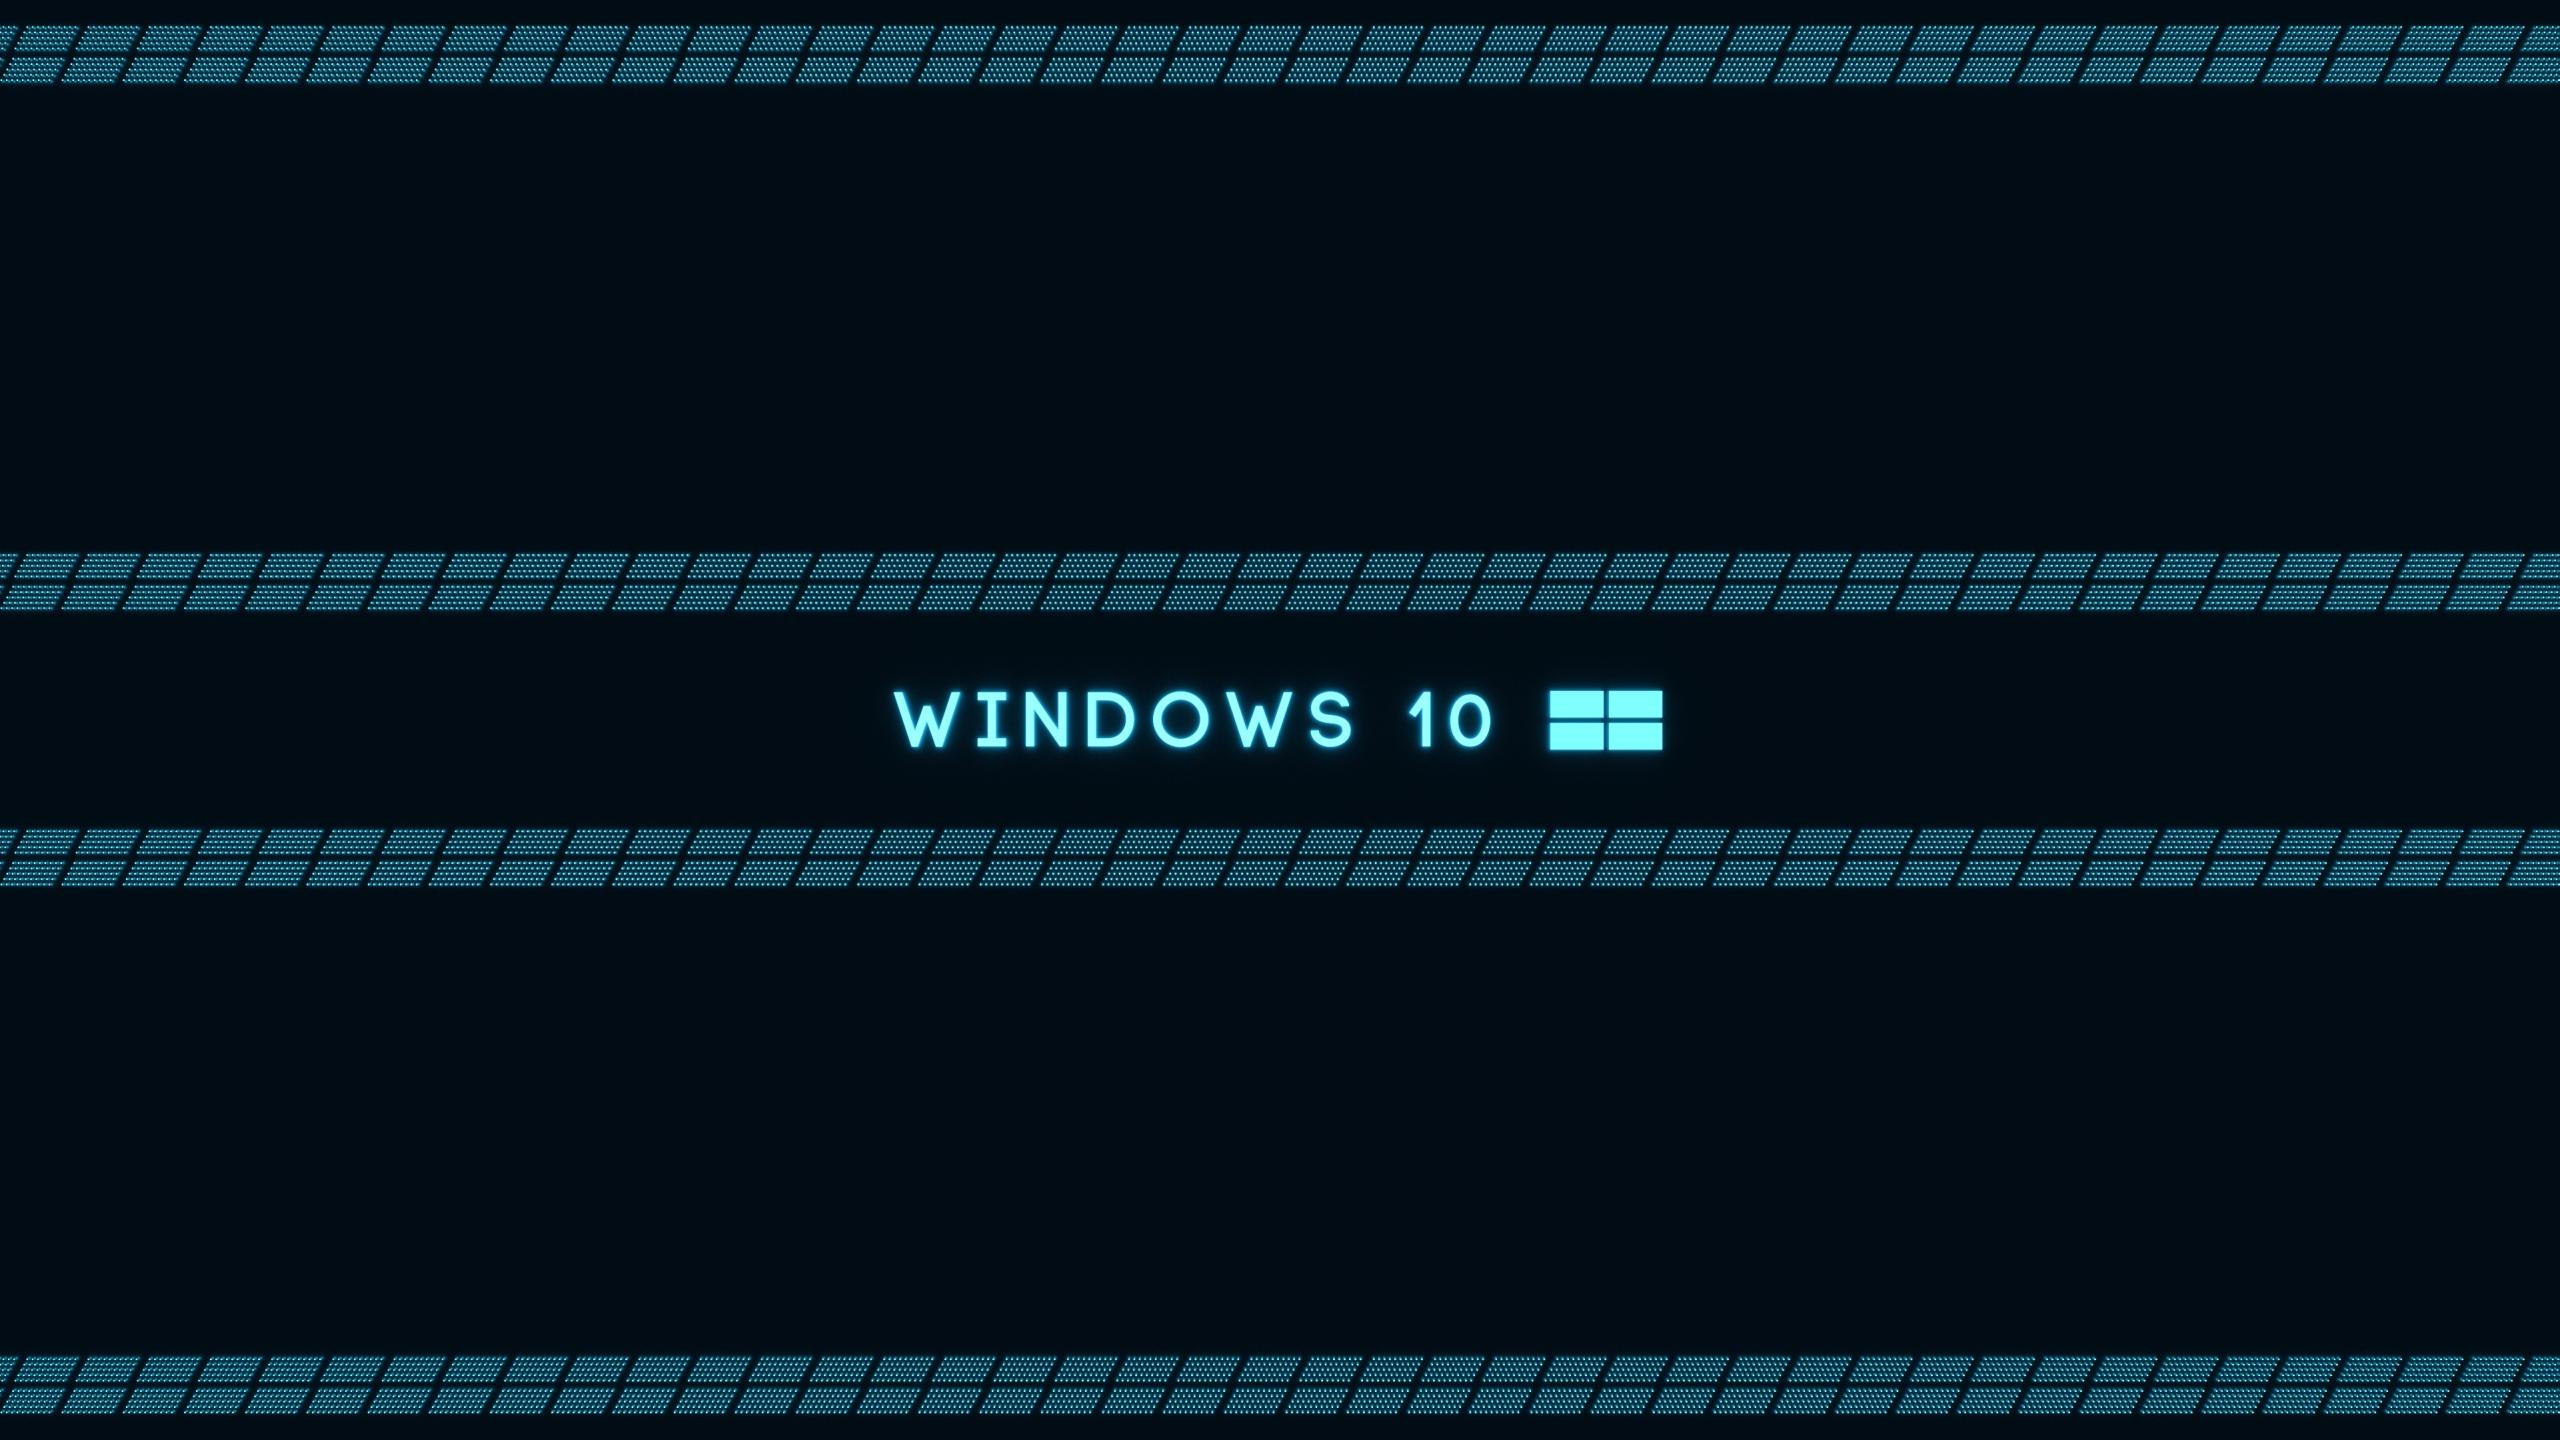 46 2560x1440 Wallpaper Windows 10 On Wallpapersafari